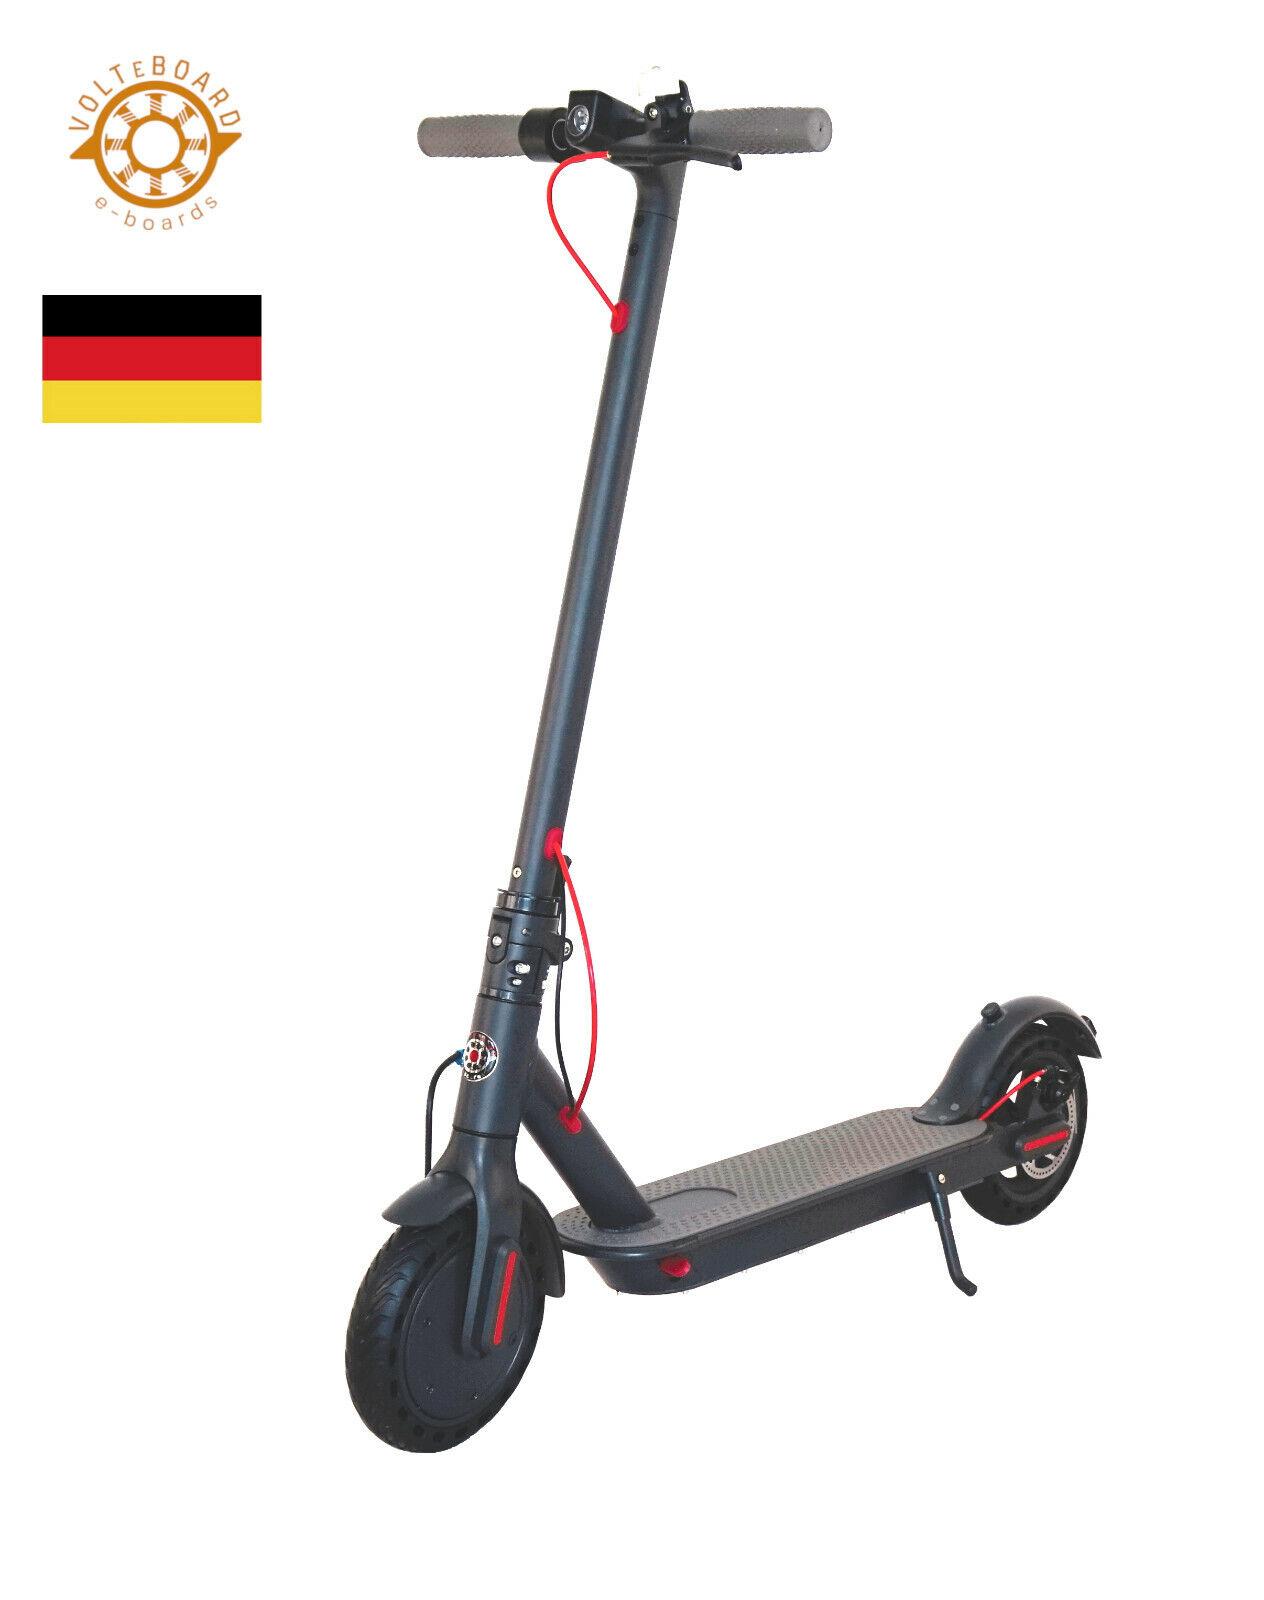 Volteboard M400 500W eScooter e-Scooter Elektro Roller Faltbar Scooter Aluminium